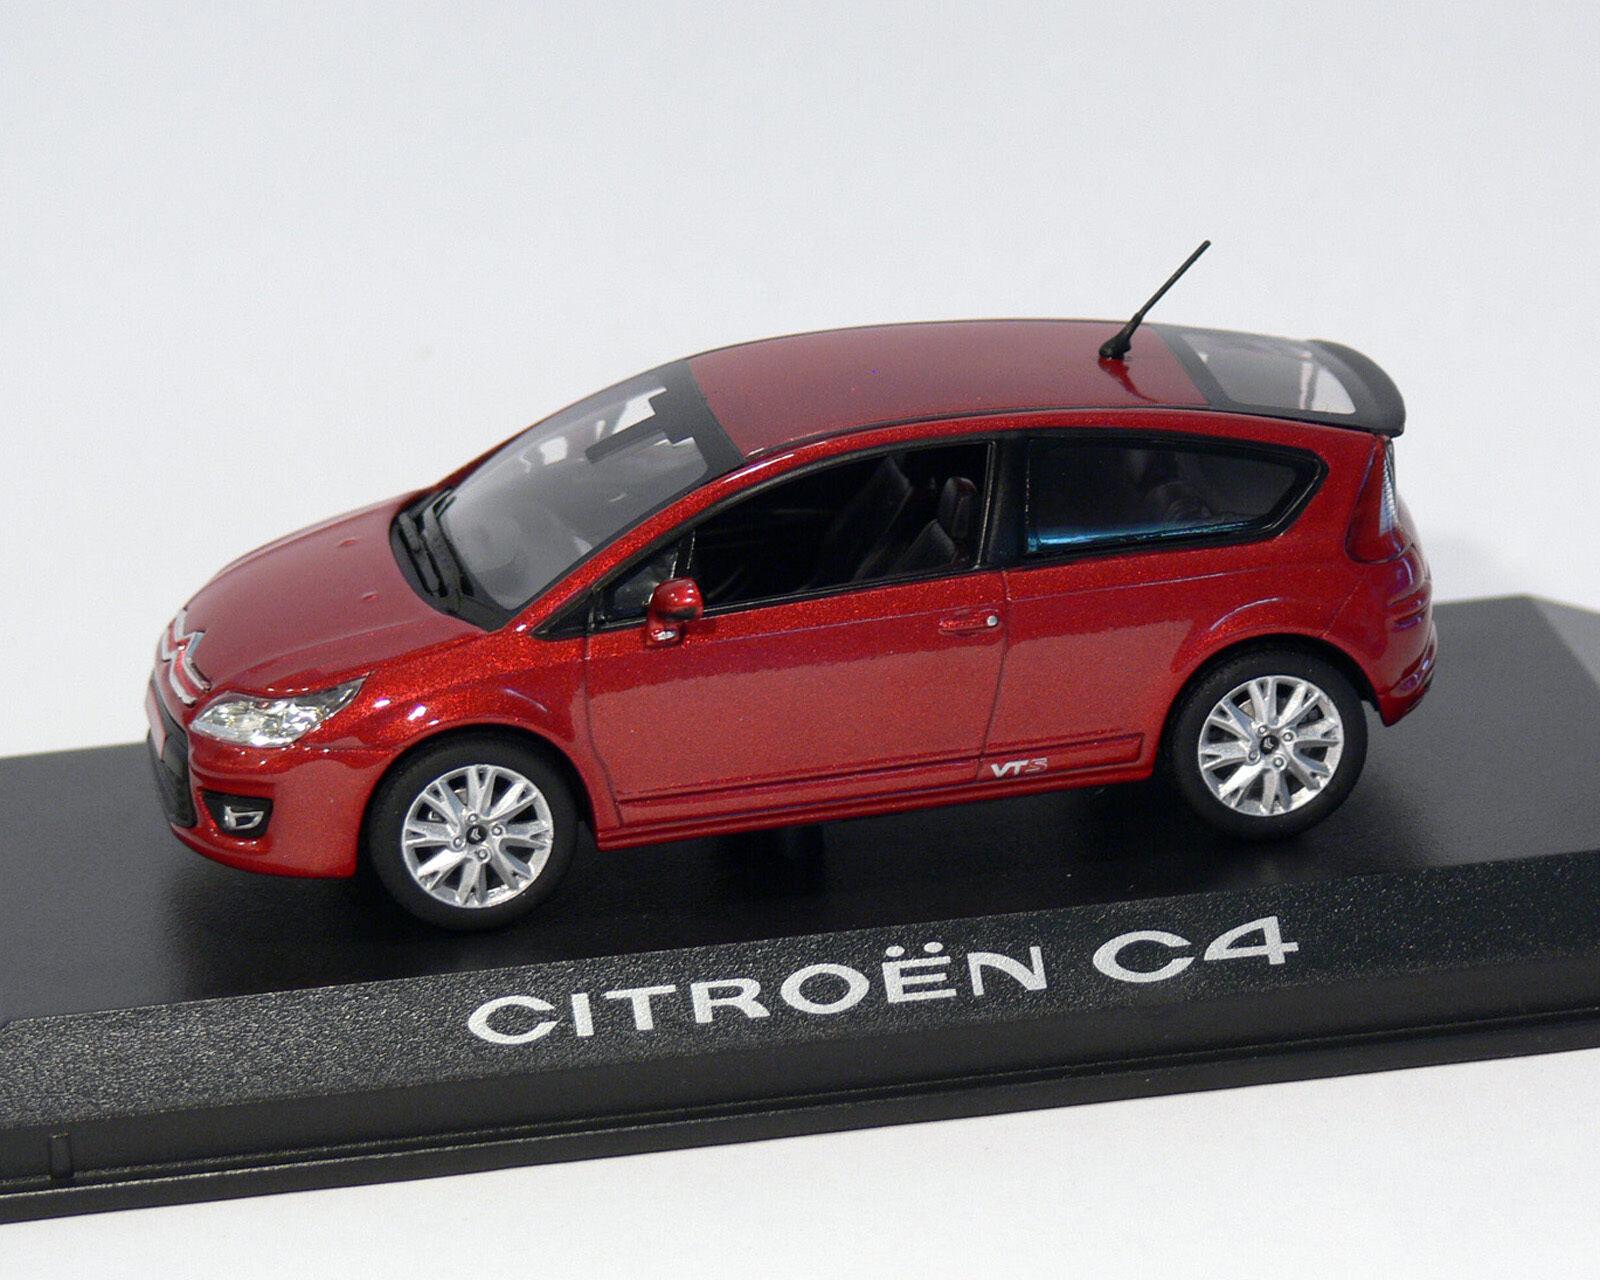 Citroen C4 Coupe, Red Metallic, 2008, Norev 1 43